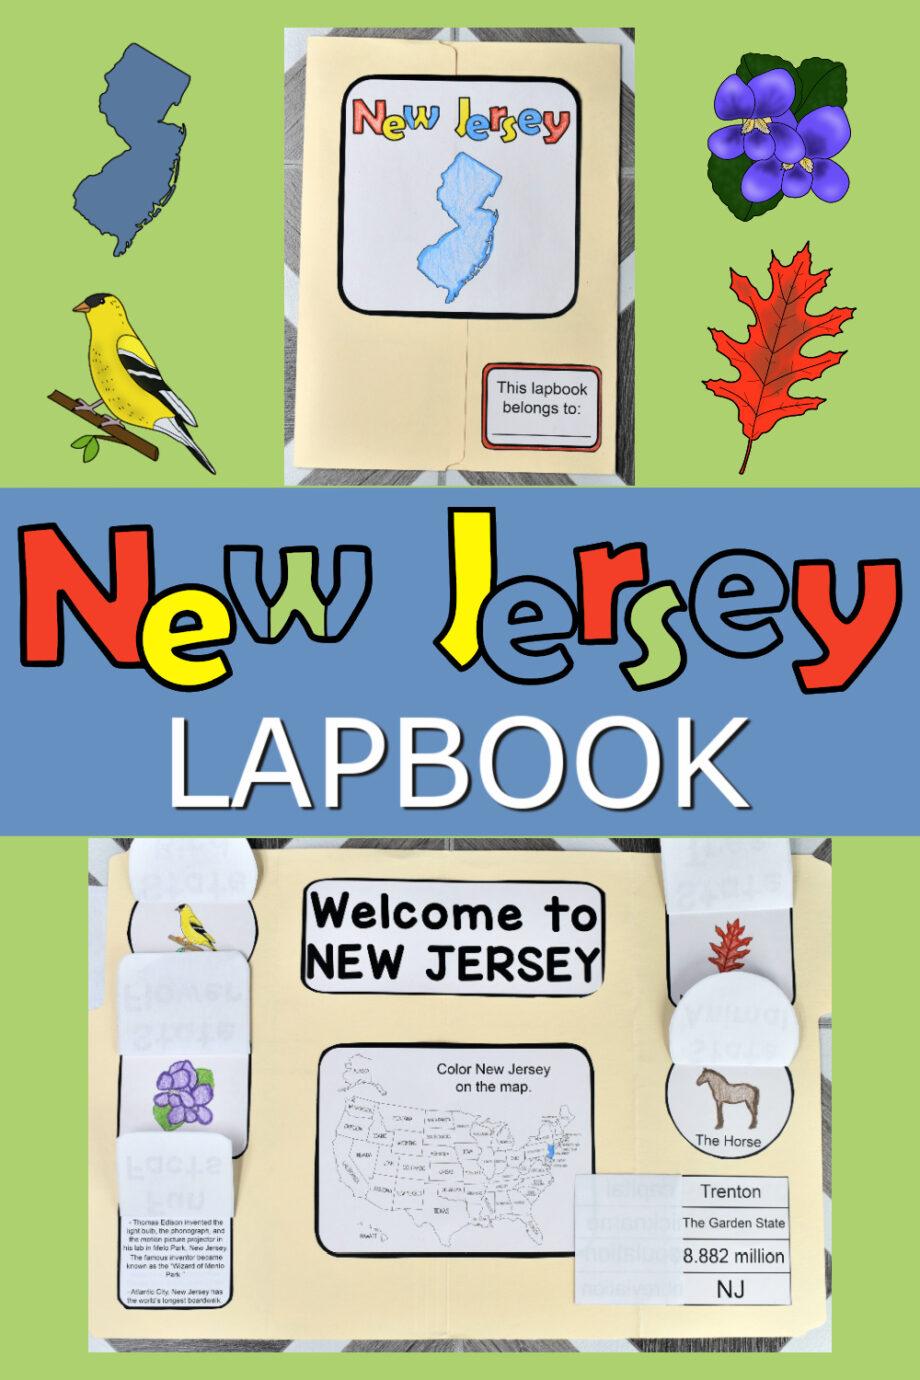 New Jersey Lapbook Elements